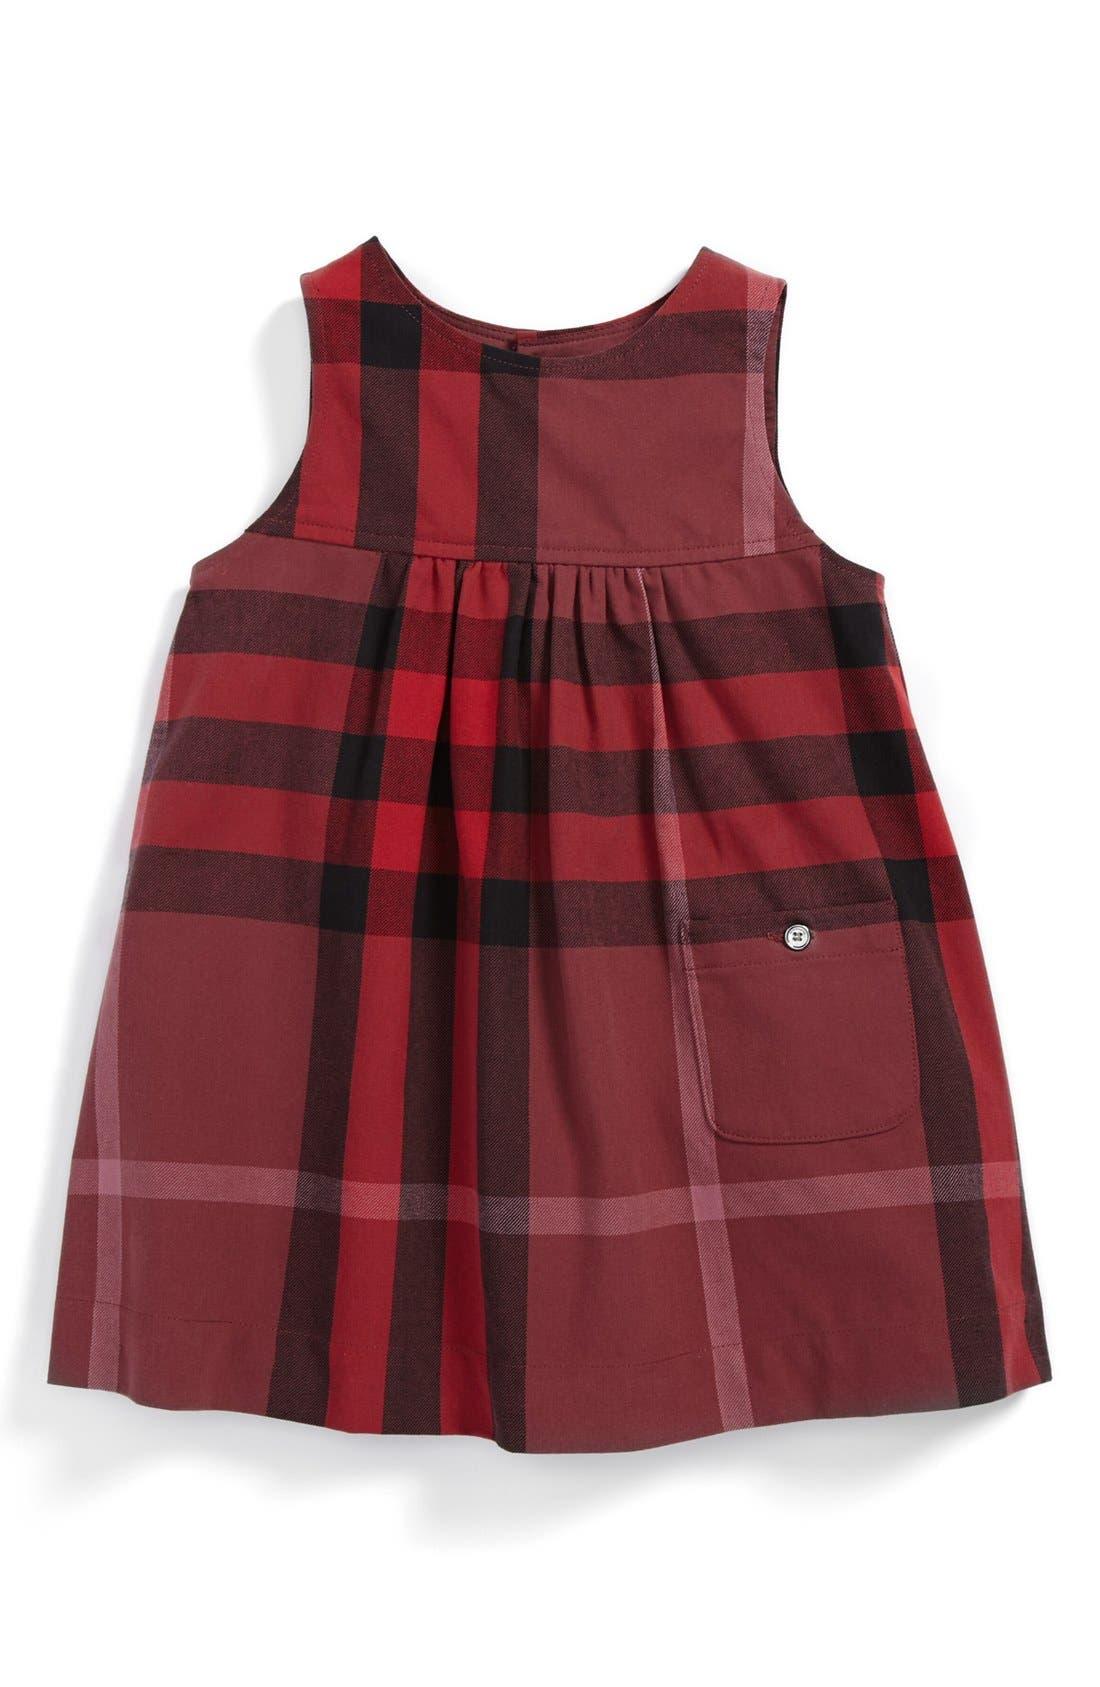 Alternate Image 1 Selected - Burberry 'Della' Dress (Baby Girls)